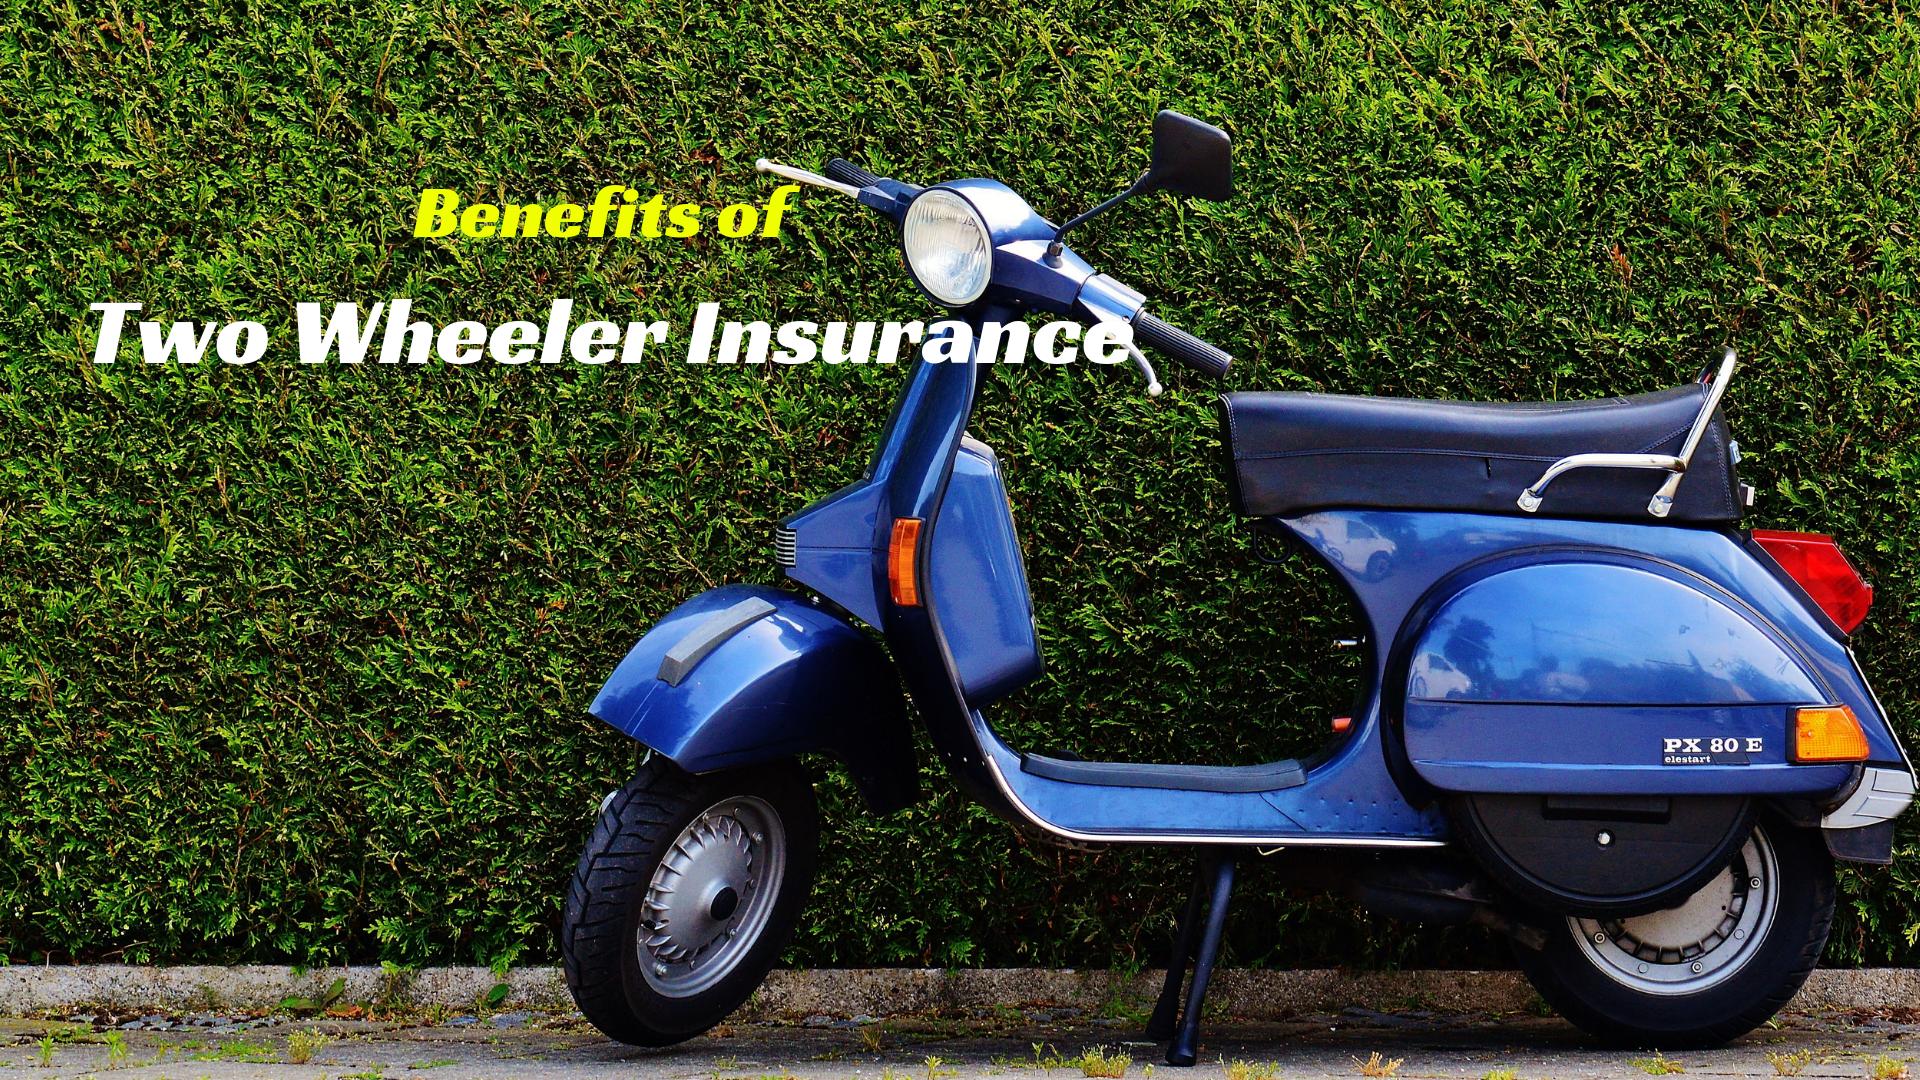 Top Benefits of Long Term Two Wheeler Insurance